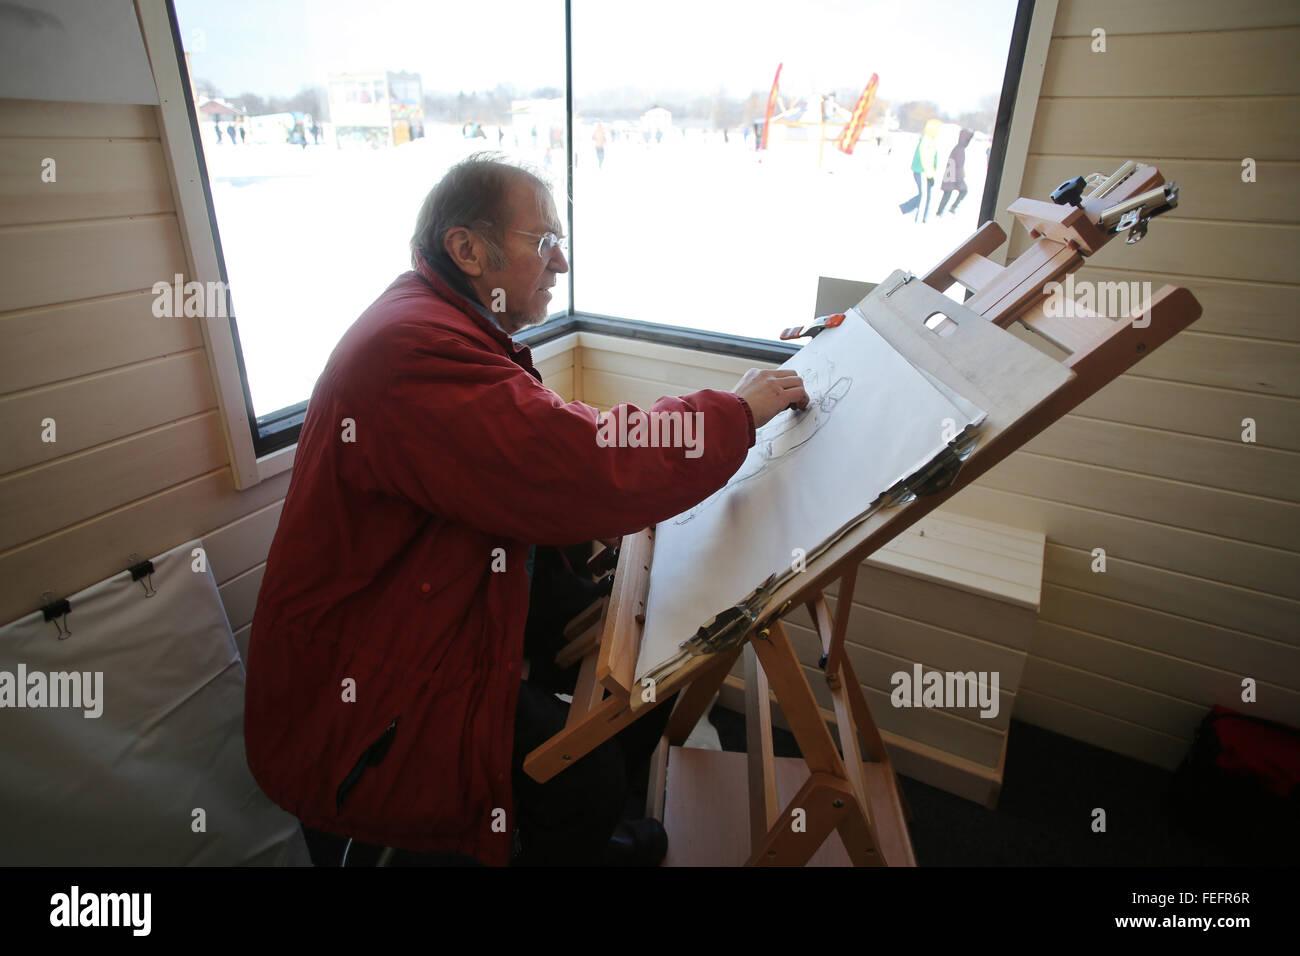 Minnesota Winter Window Stockfotos & Minnesota Winter Window Bilder ...